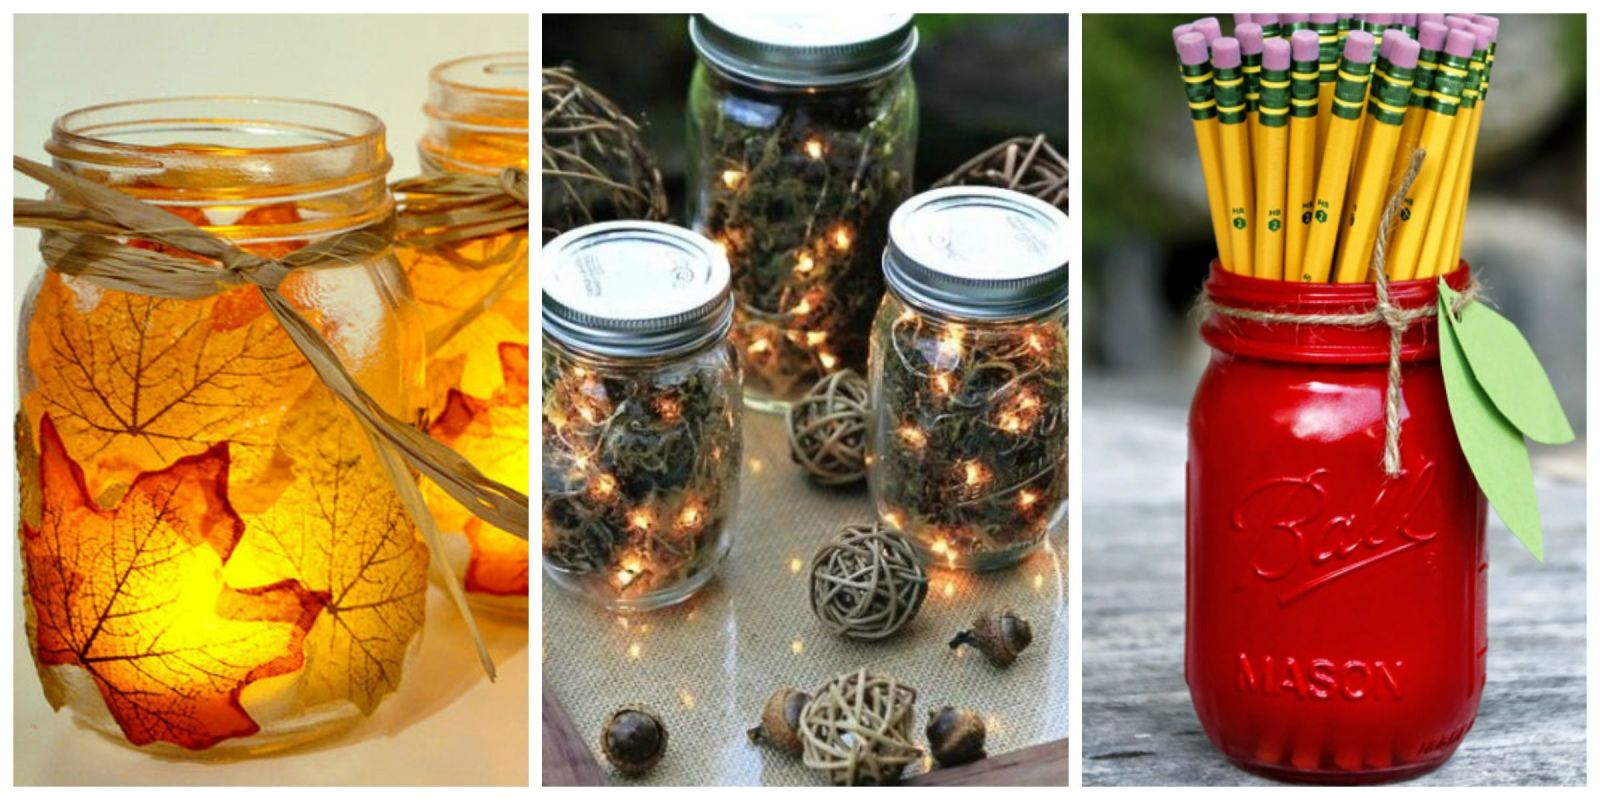 Autumn DIY Ideas With Mason Jars